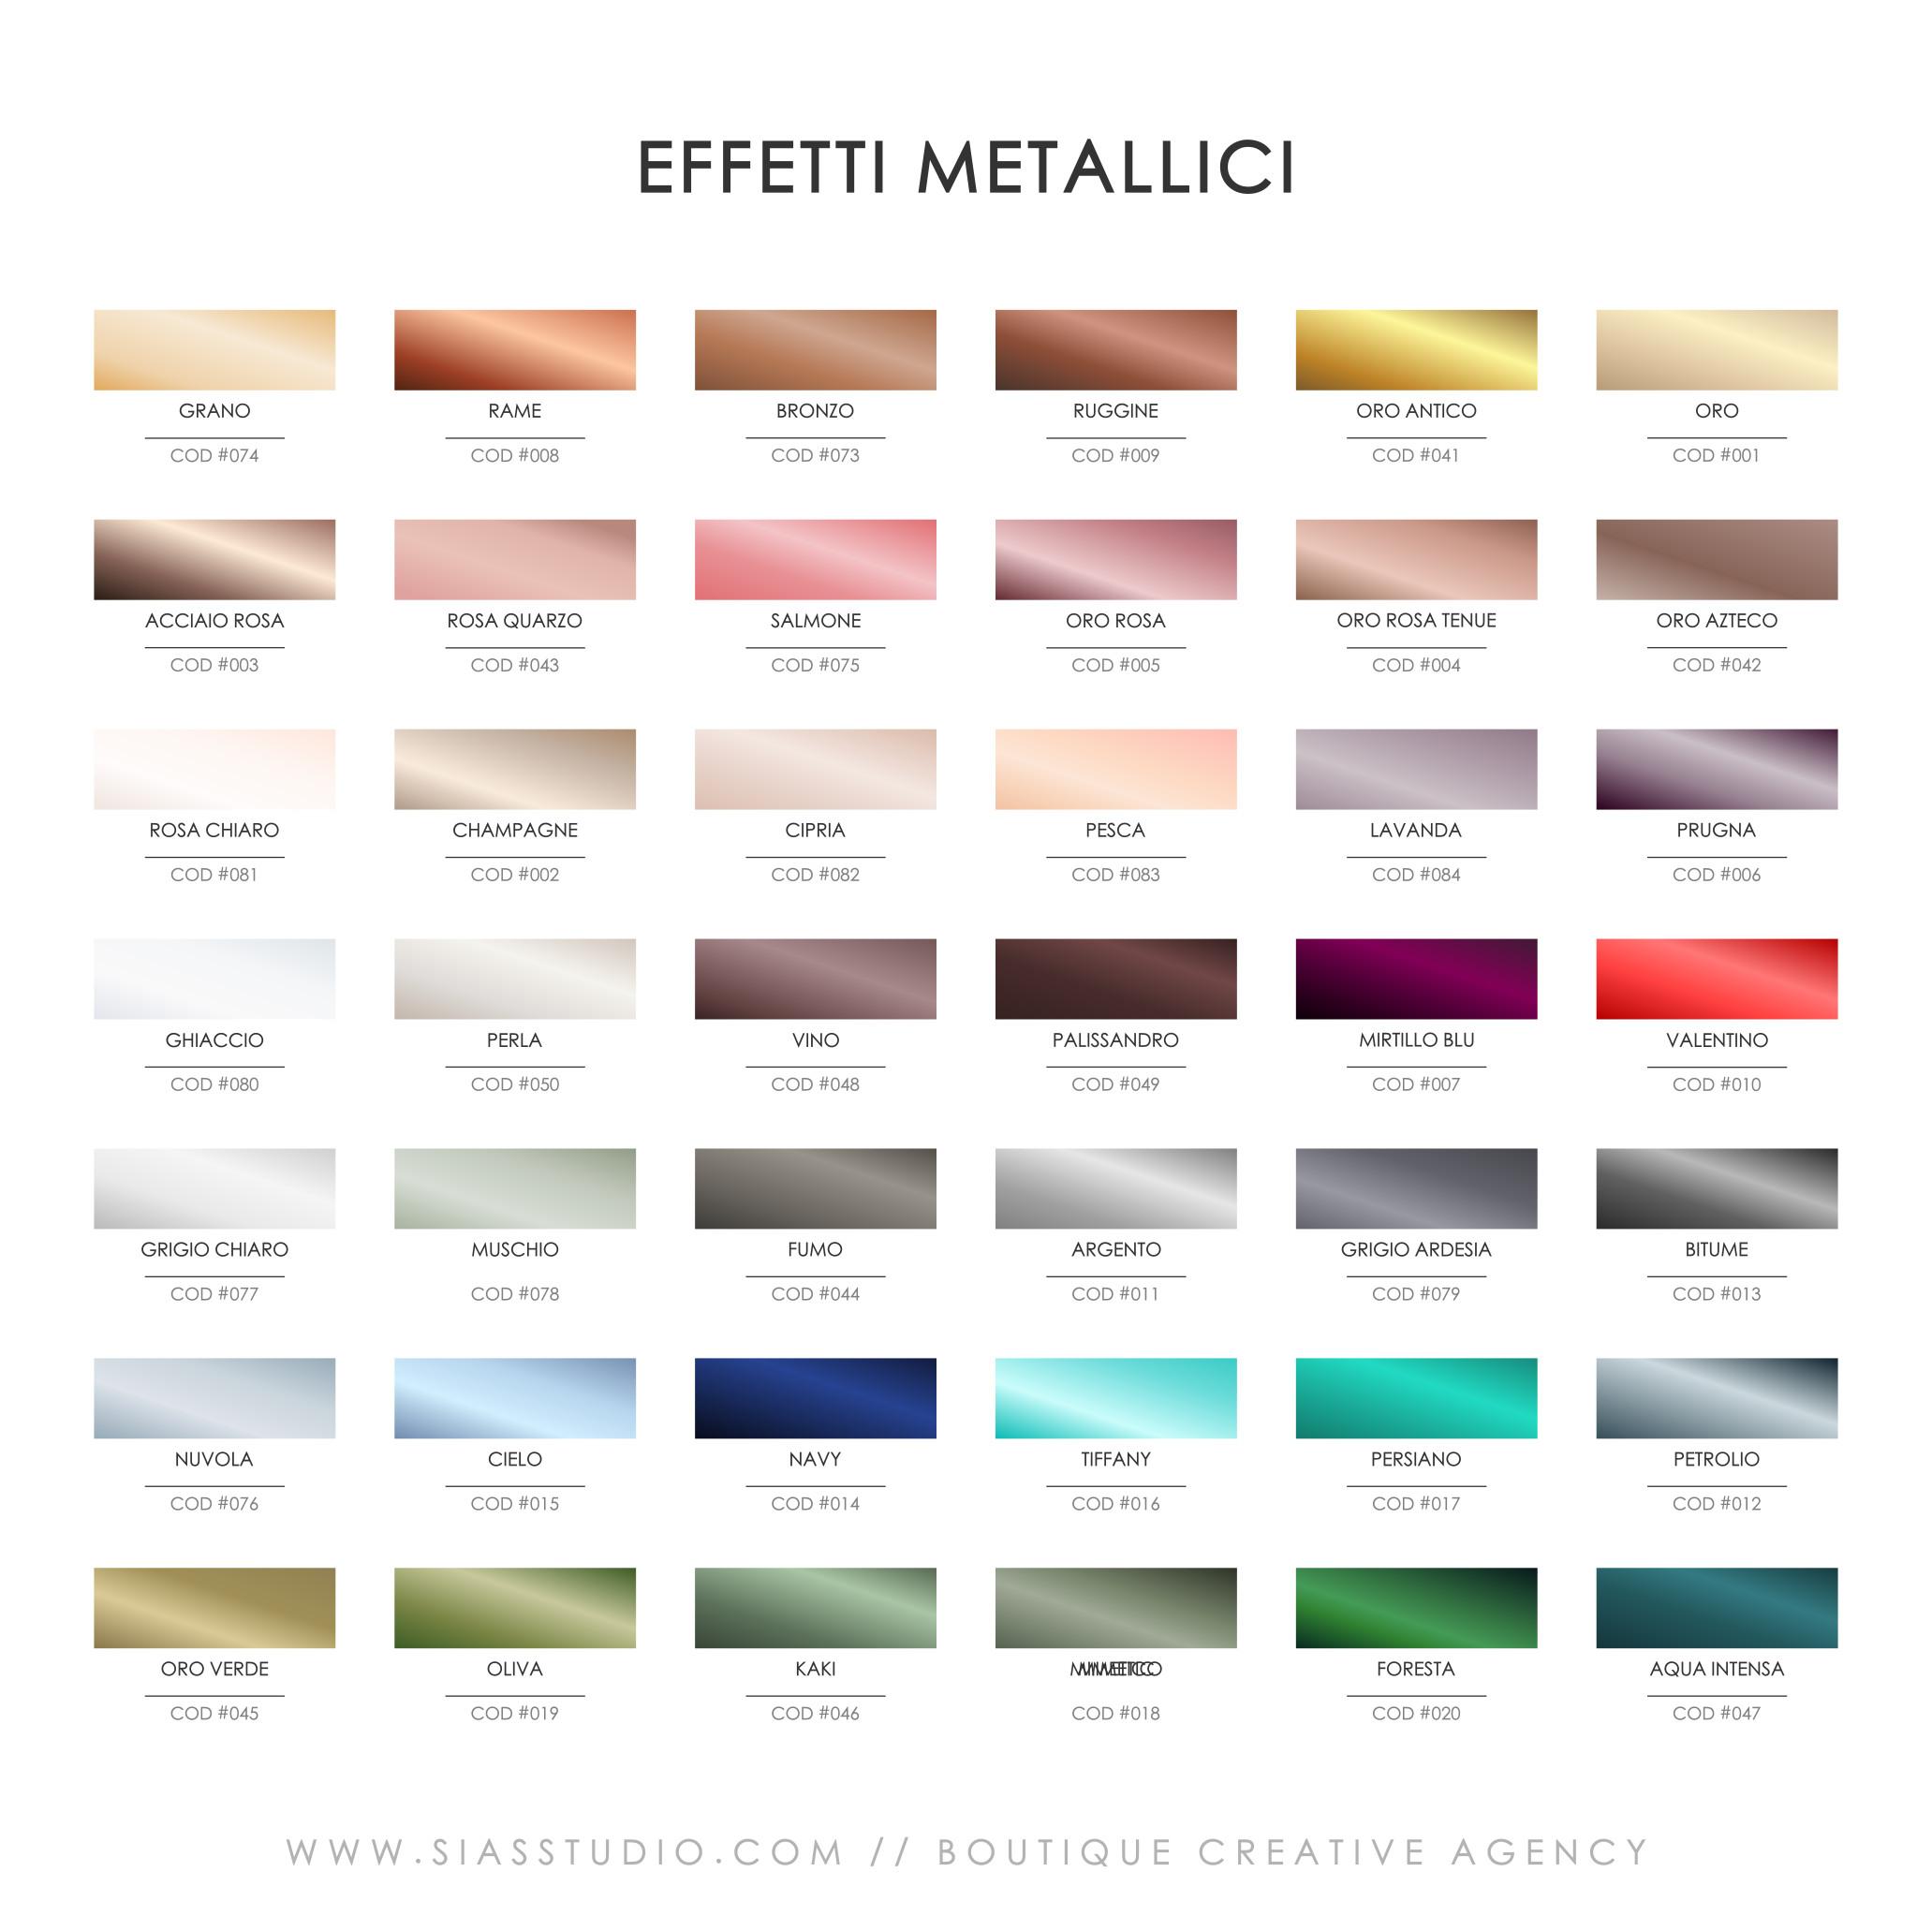 Sias Studio - Effetti Metallici